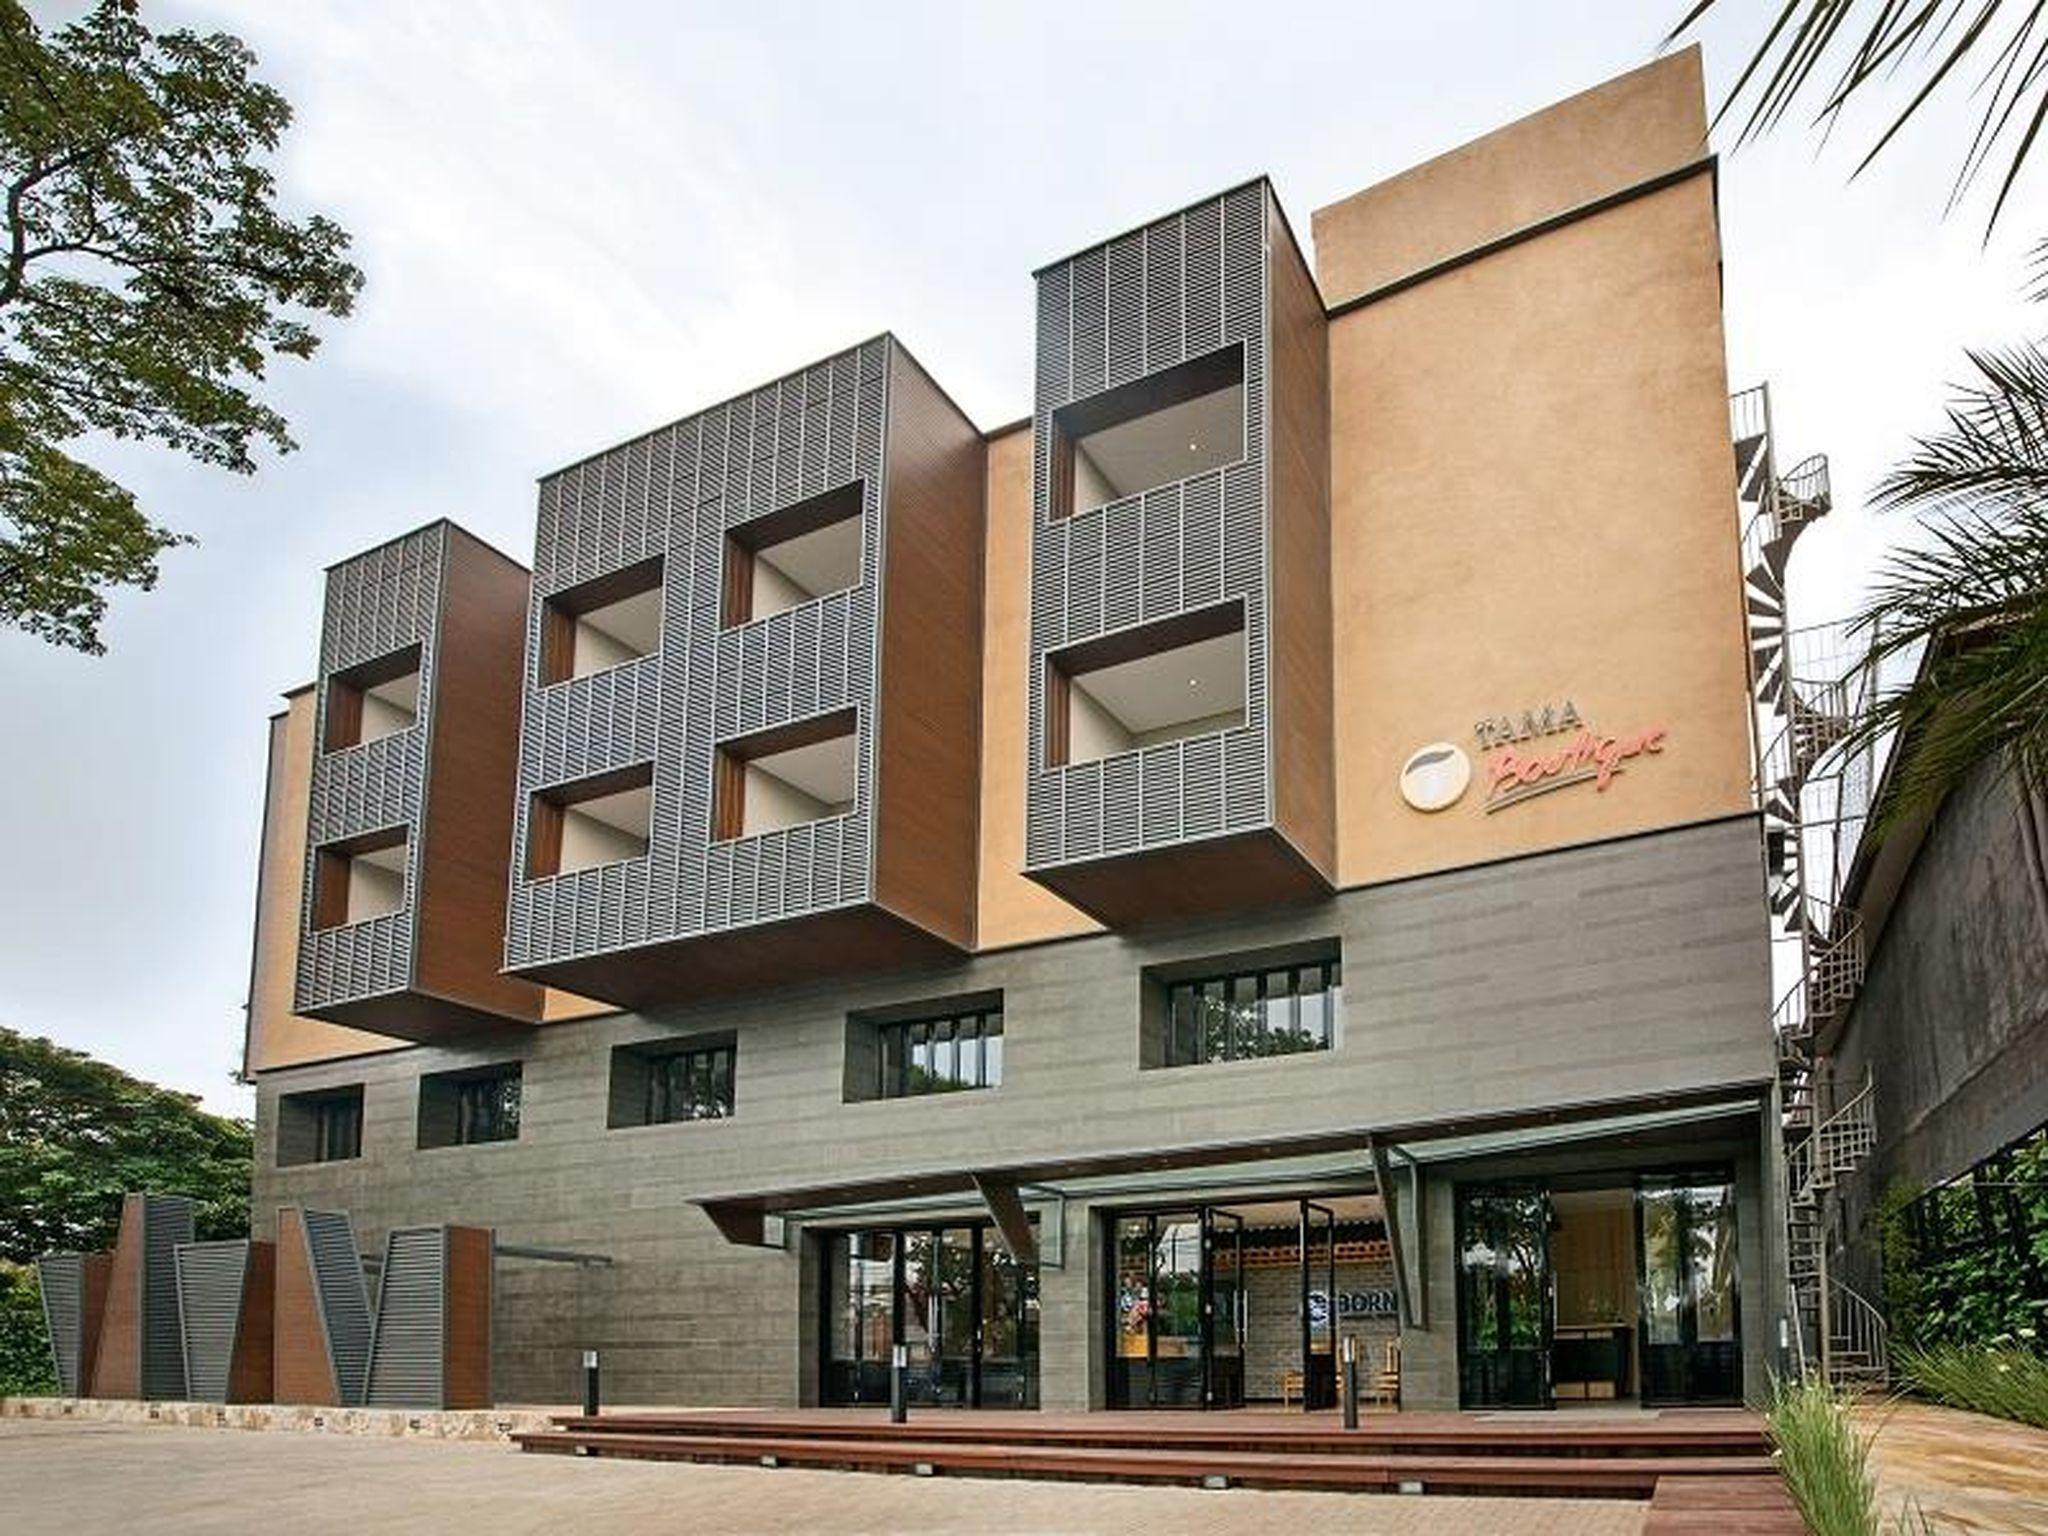 Hotel Tama Boutique Hotel - Dr. Rajiman No. 5 Bandung 40171 West Java- Indonesian - Bandung